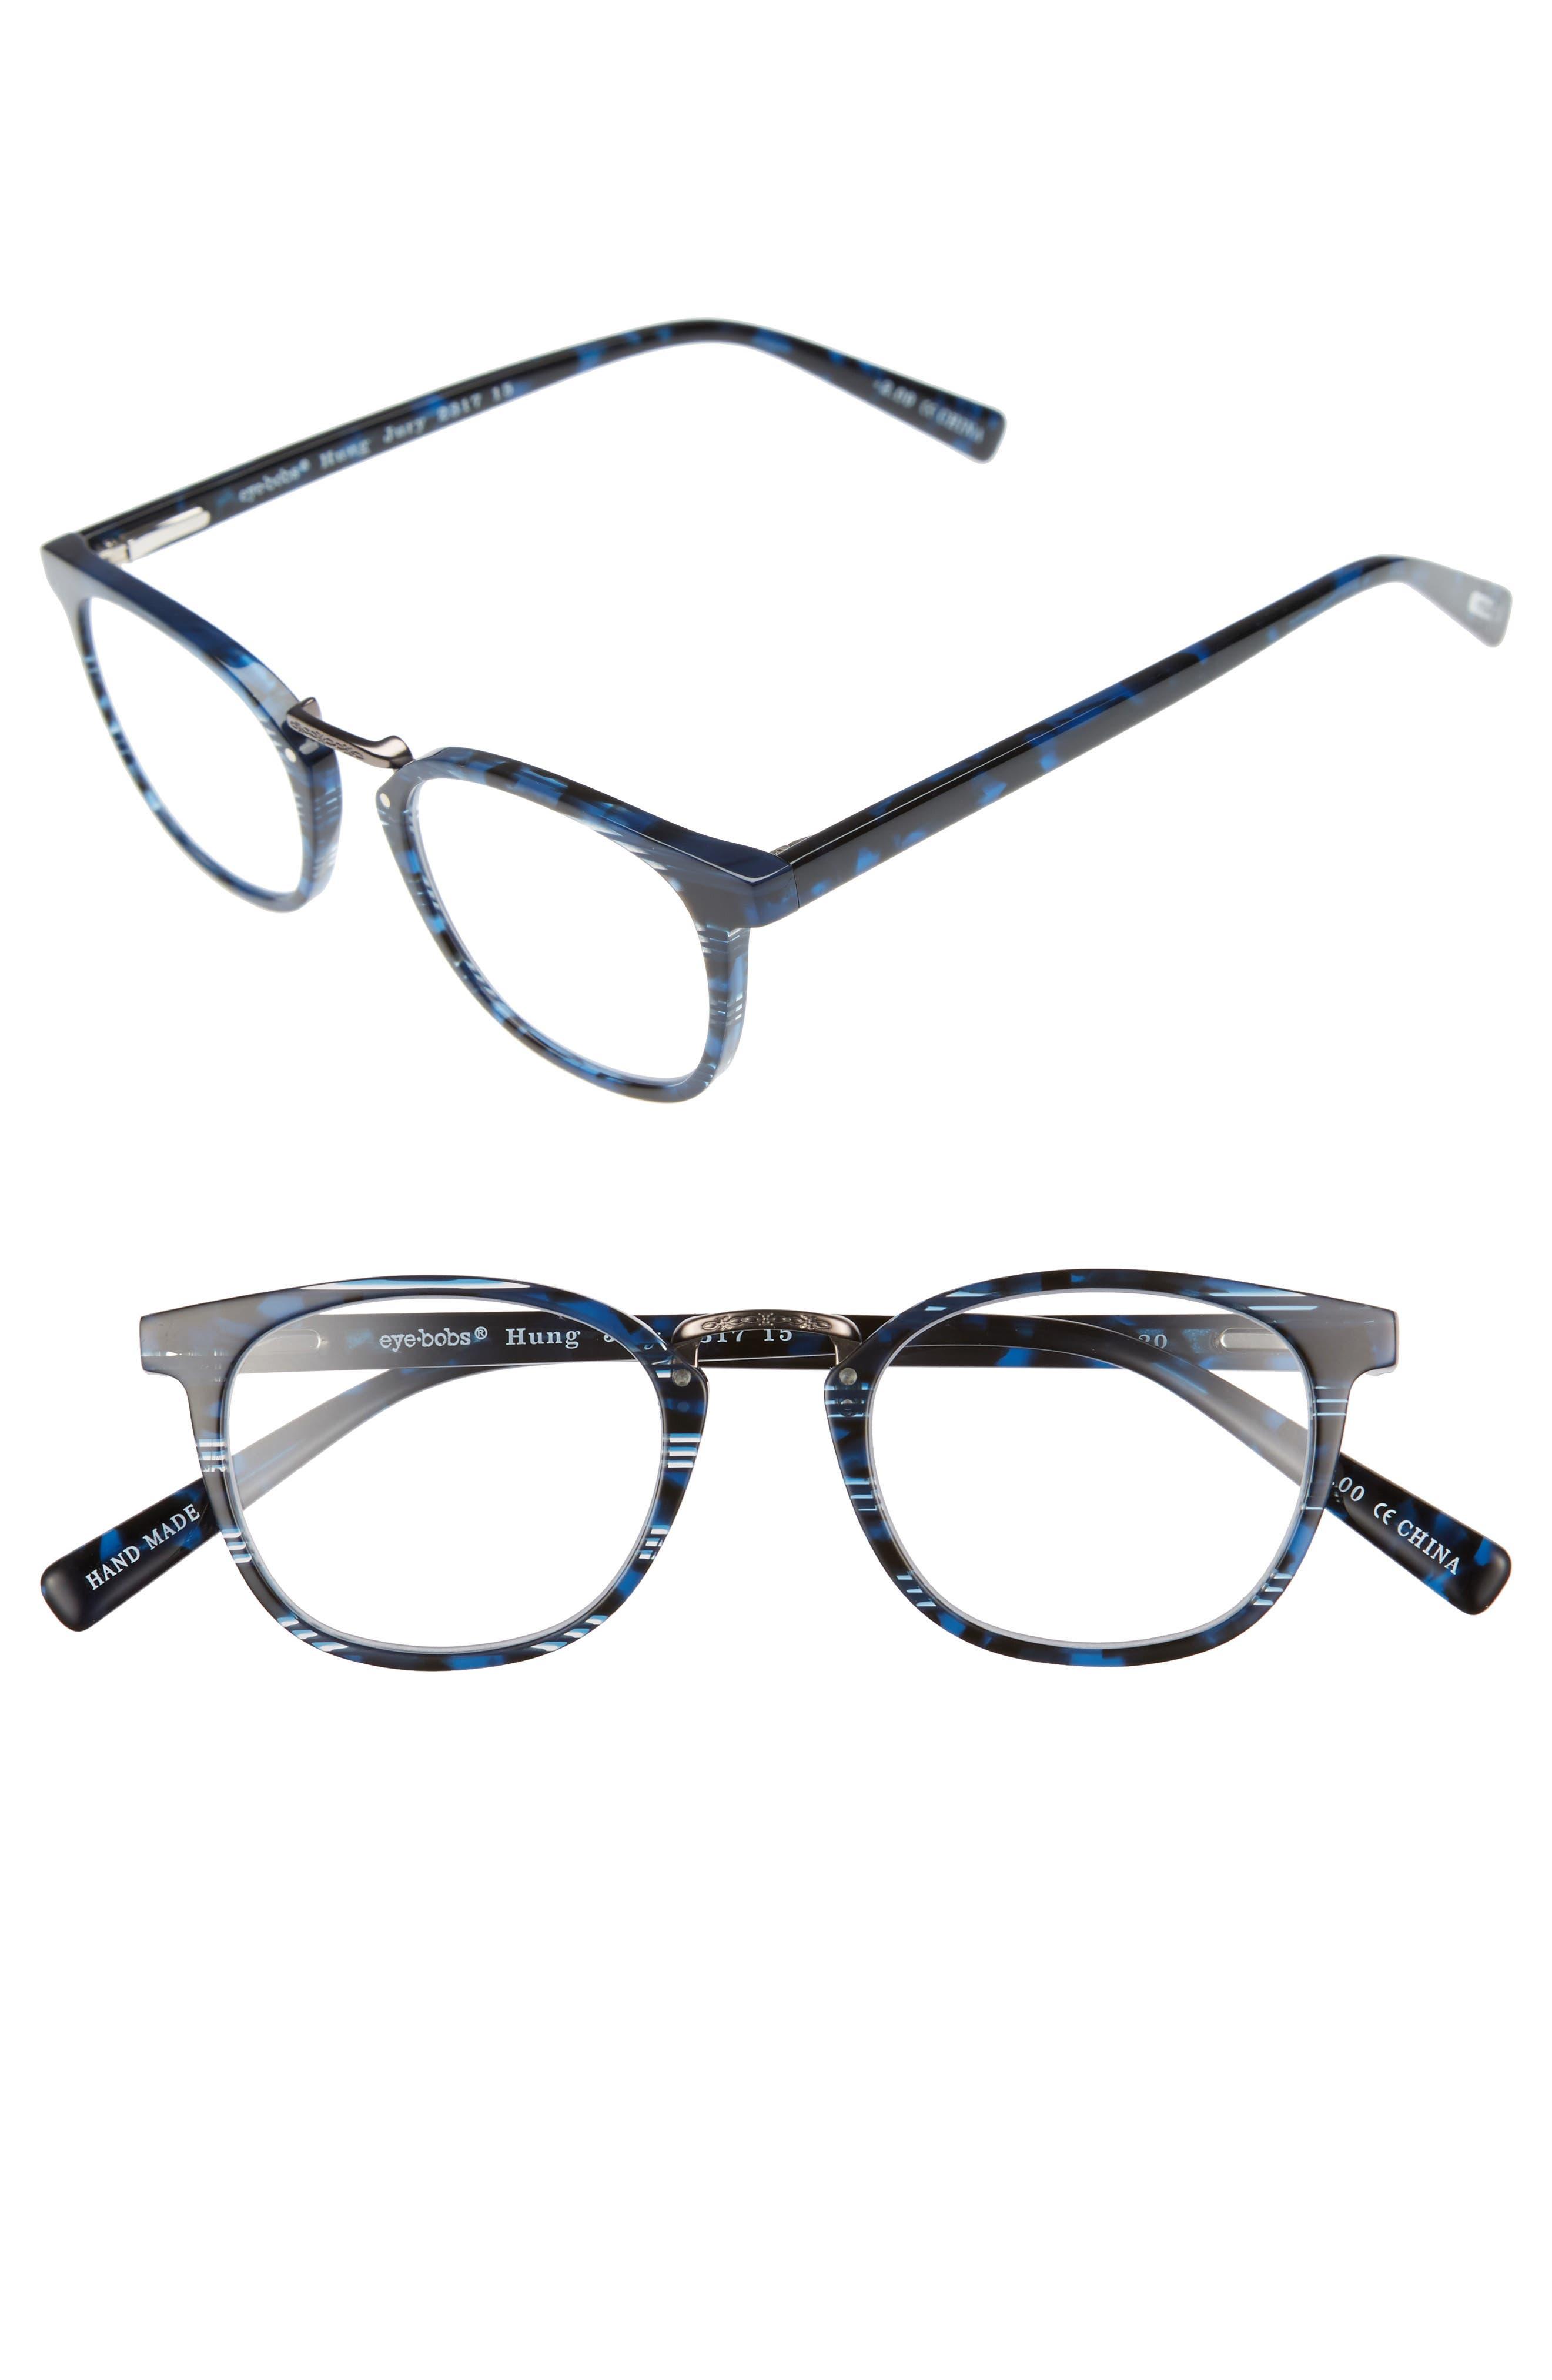 Hung Jury 46mm Reading Glasses,                         Main,                         color, BLUE TORTOISE